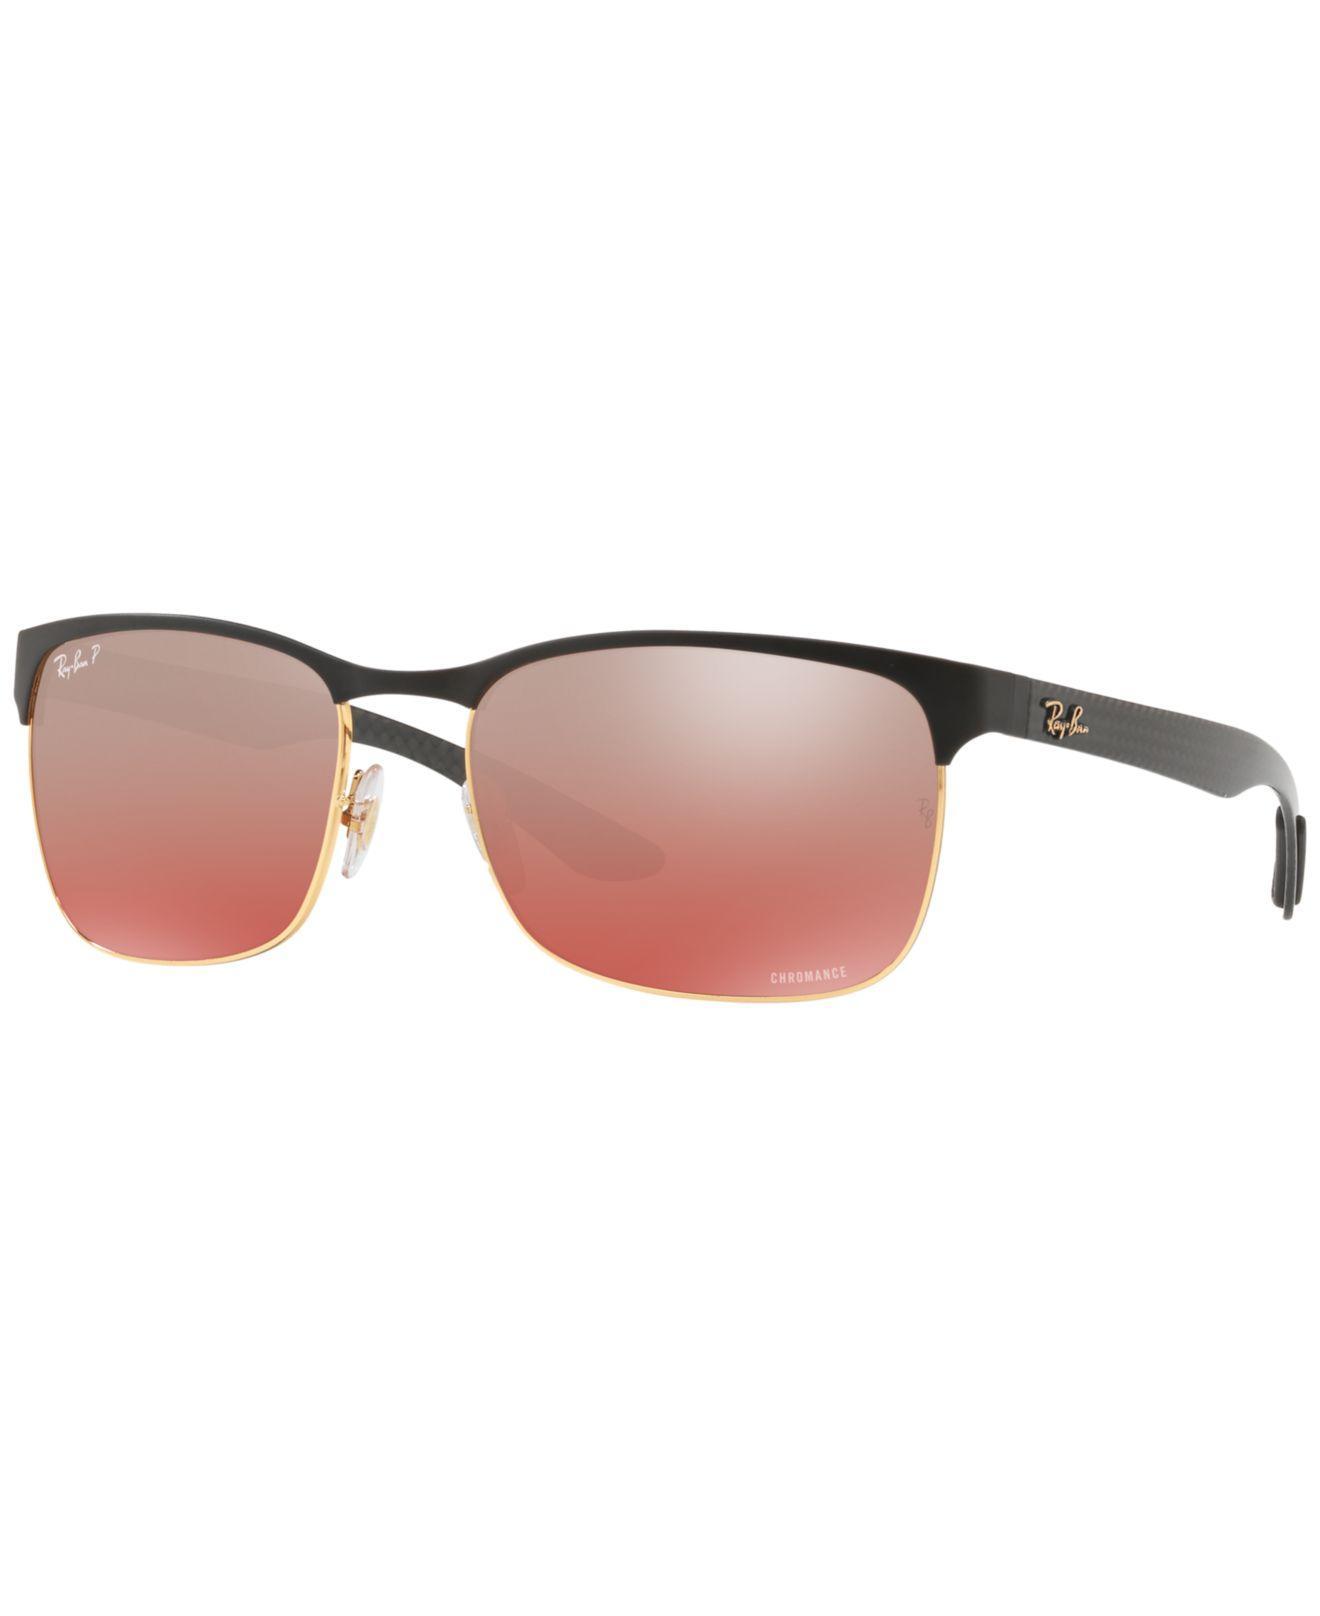 241a950b0a Ray-Ban. Men s Metallic Polarized Sunglasses